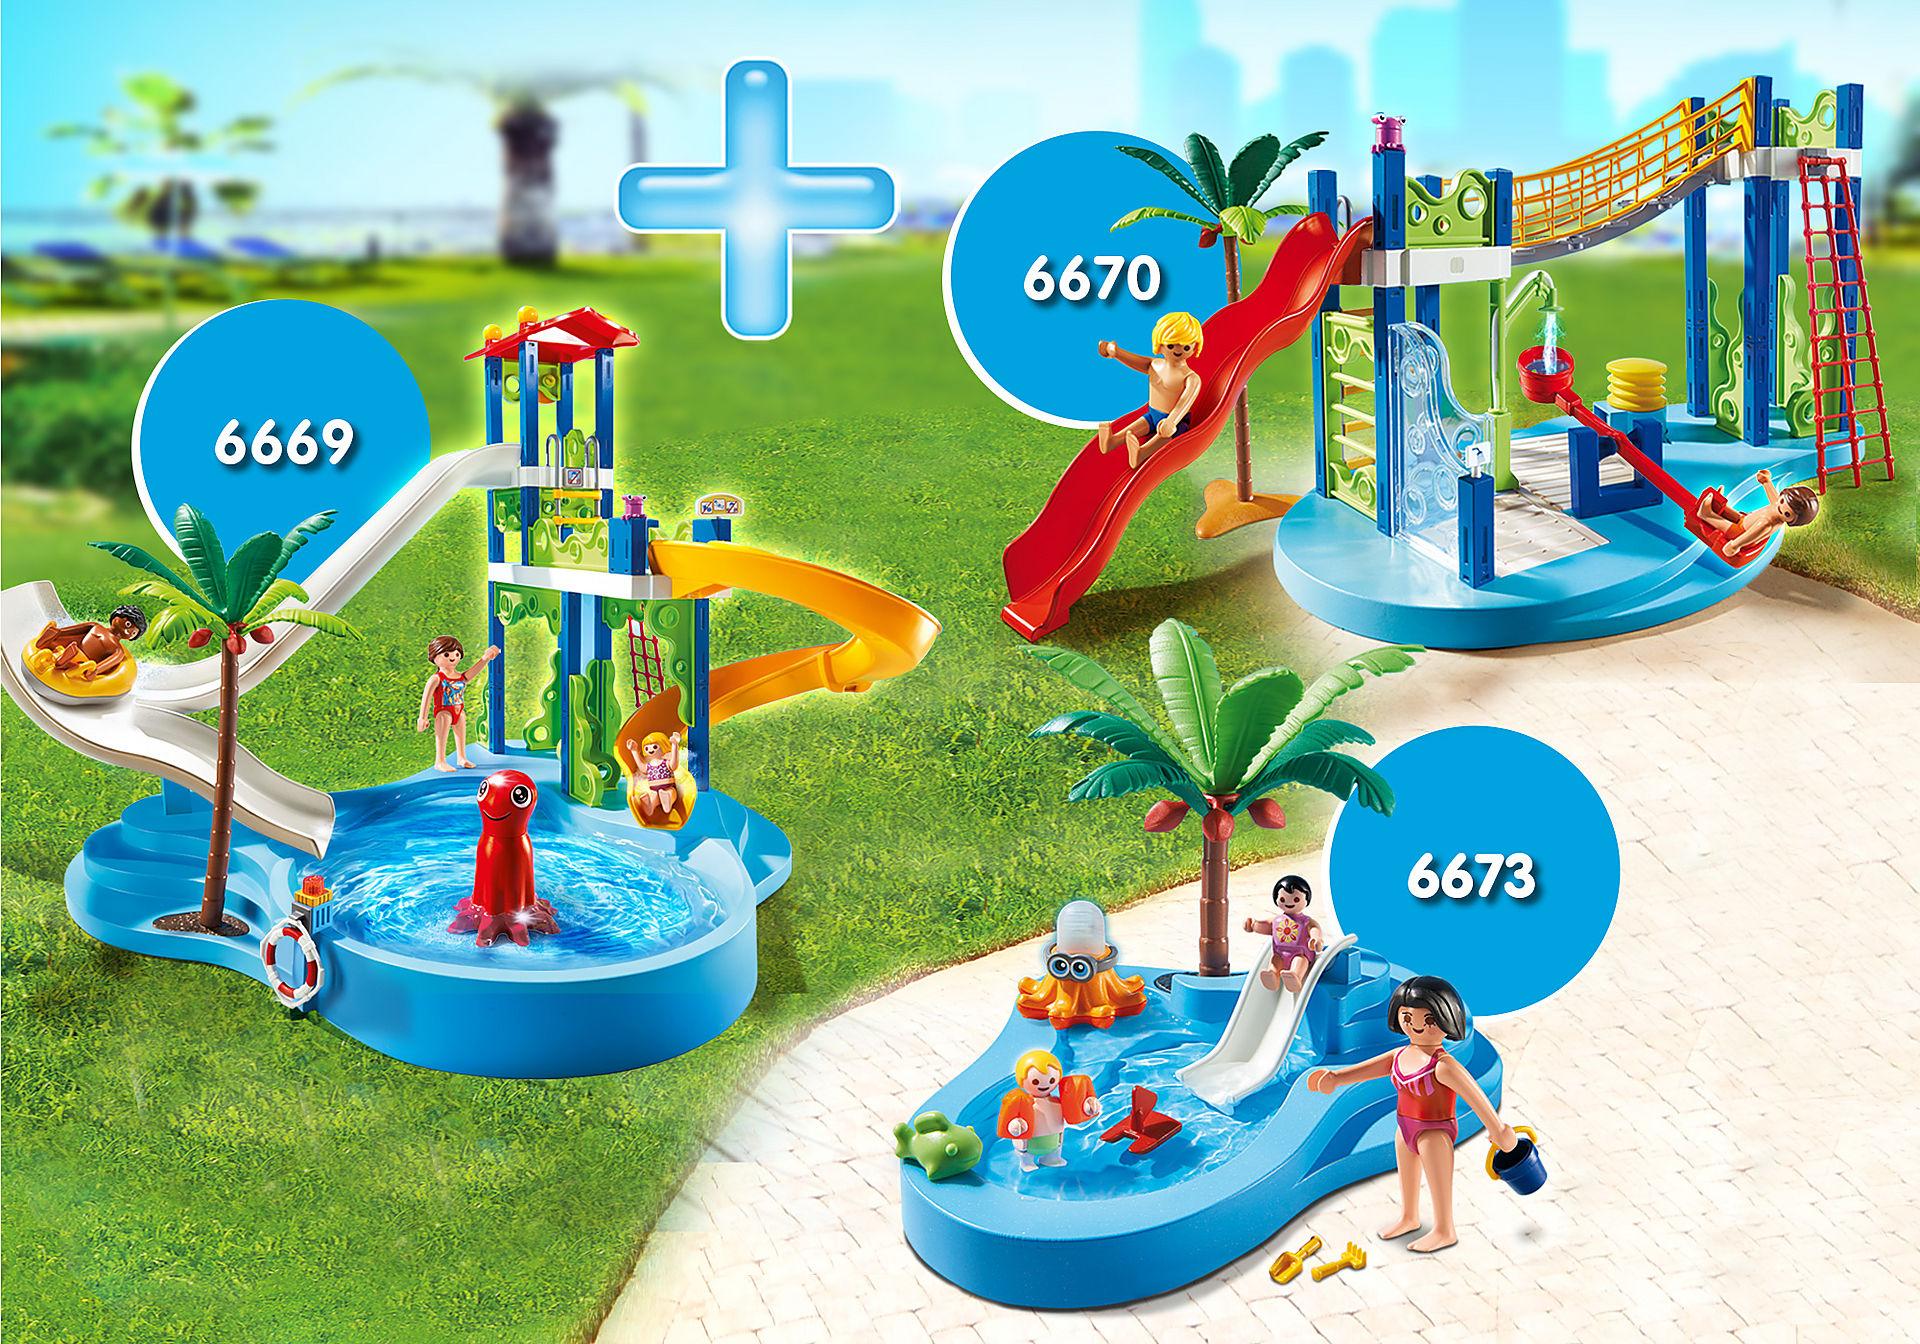 http://media.playmobil.com/i/playmobil/PM1907G_product_detail/6669 Parc aquatique avec toboggans géants 6670 Aire de jeux aquatique 6673 Bassin pour bébés et mini-toboggan